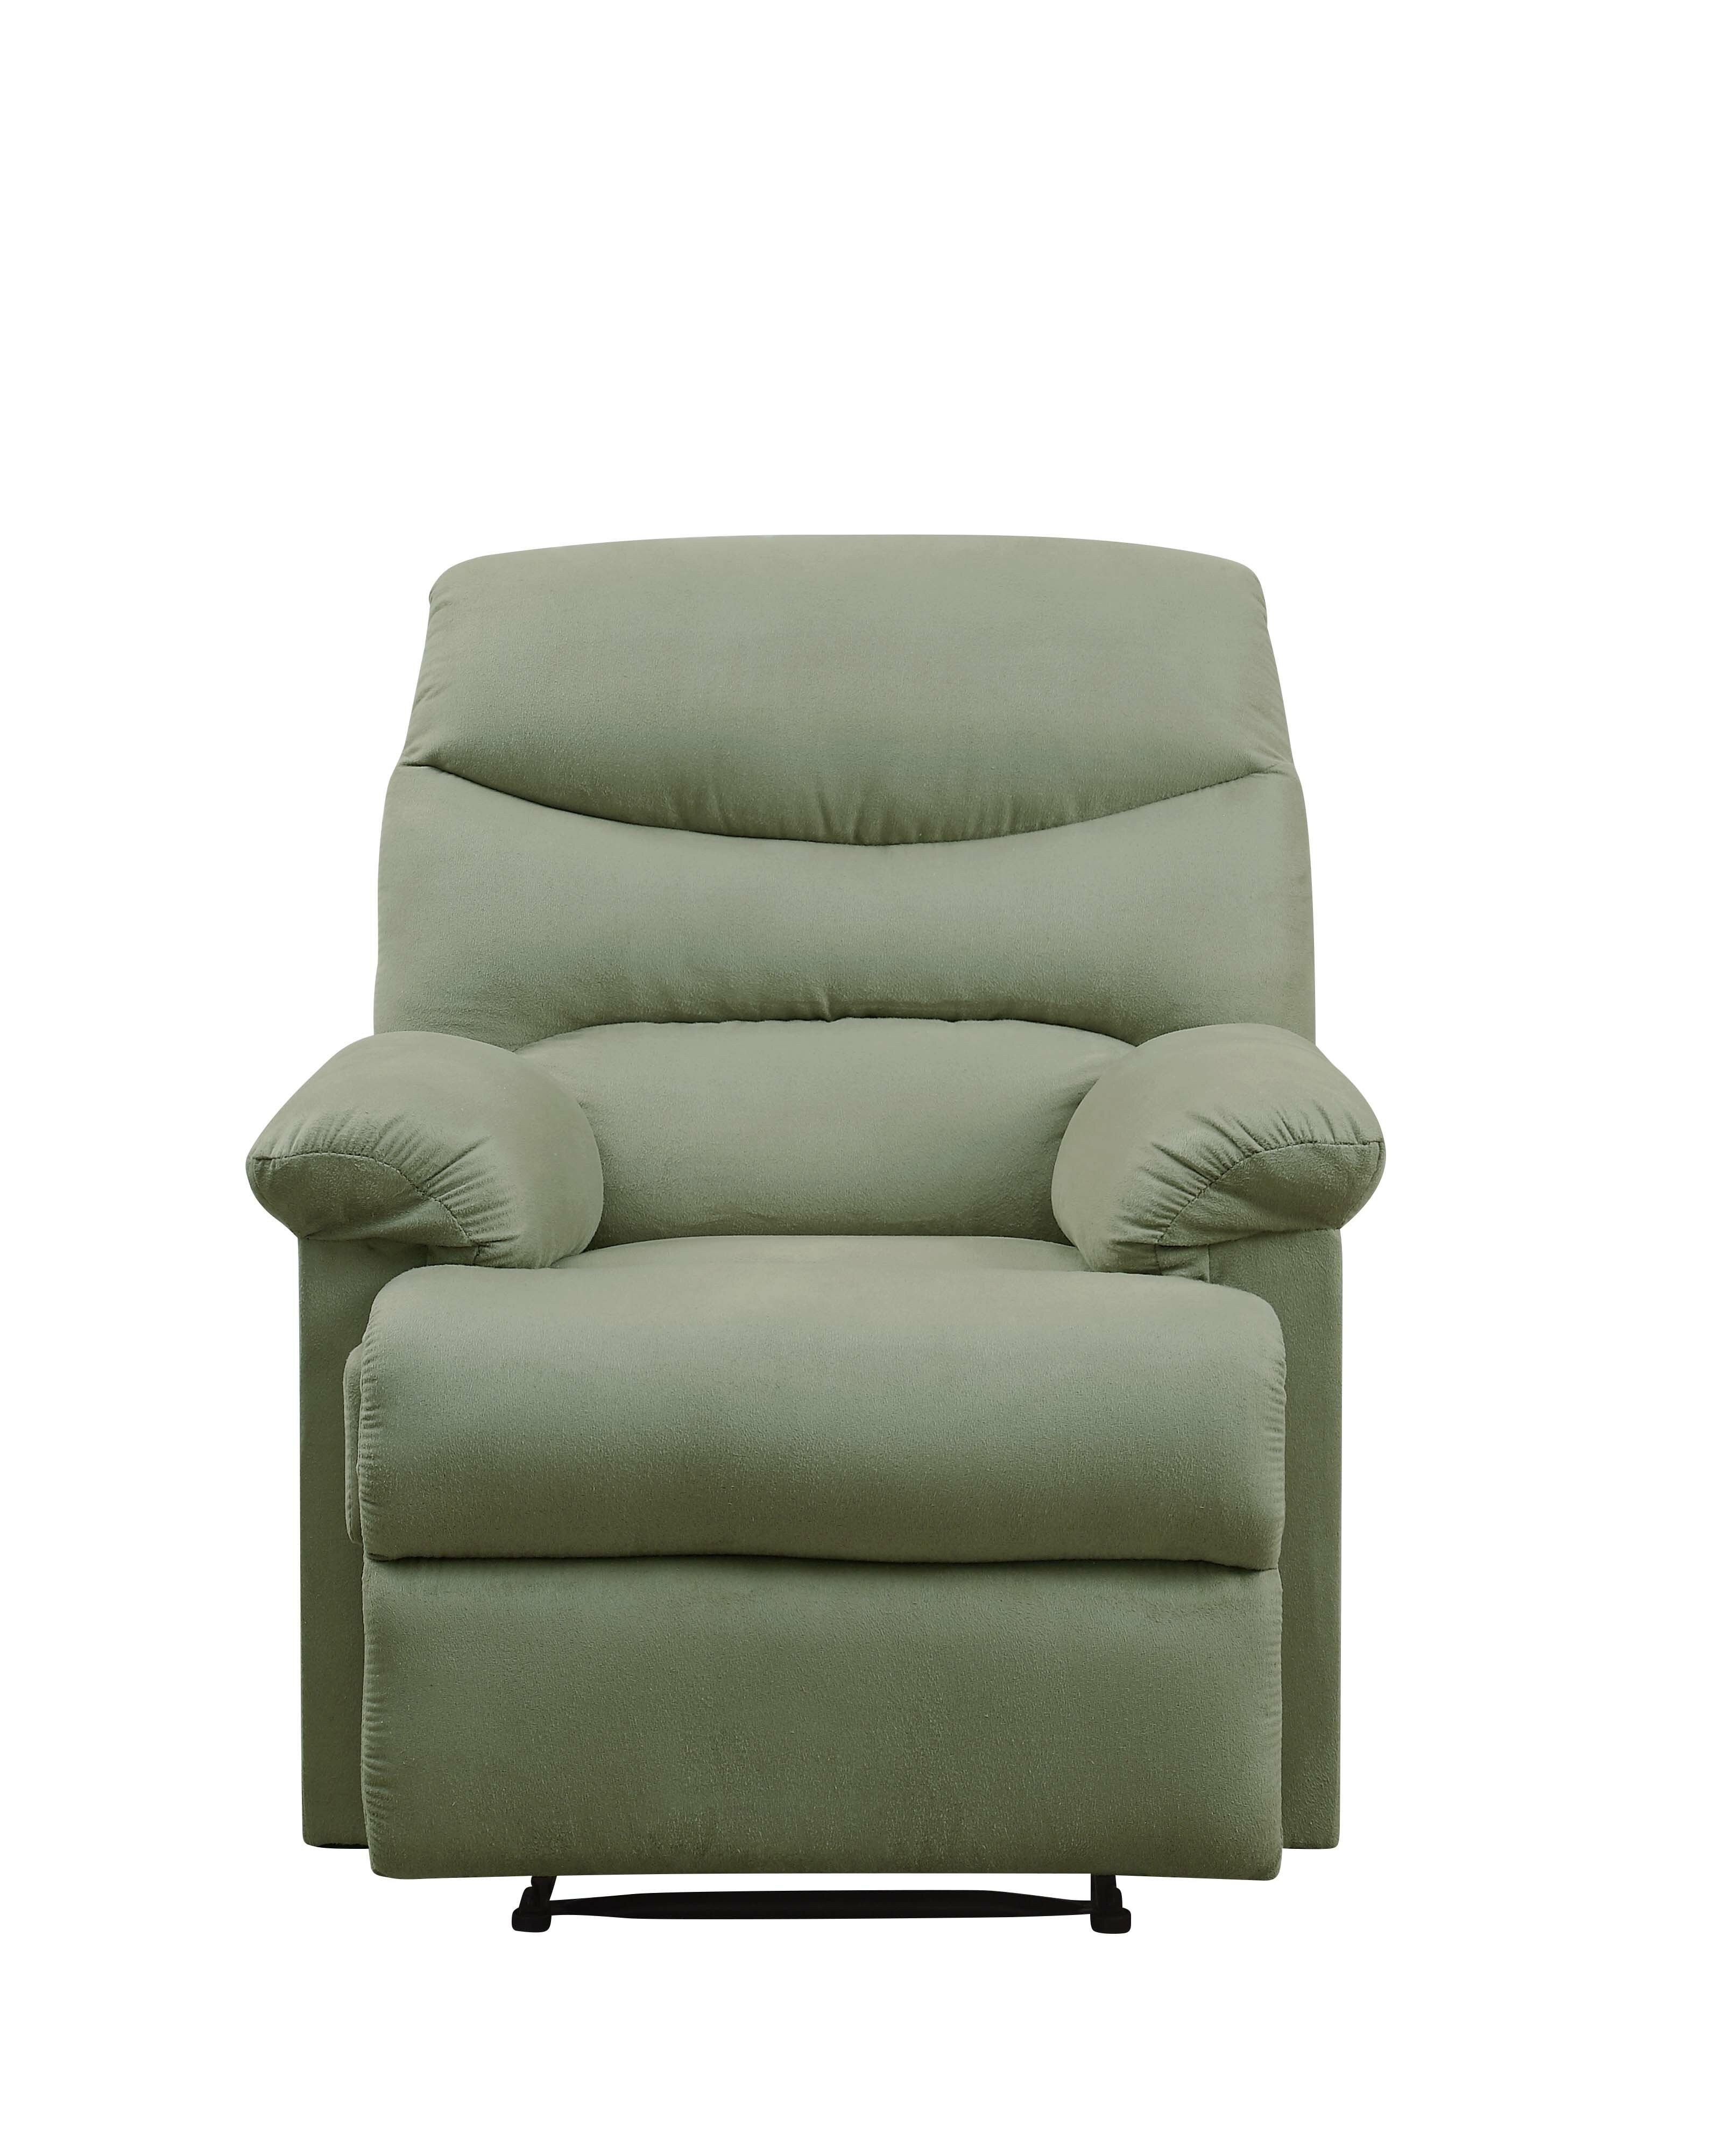 Ochlocknee Plush Chaise Manual Recliner